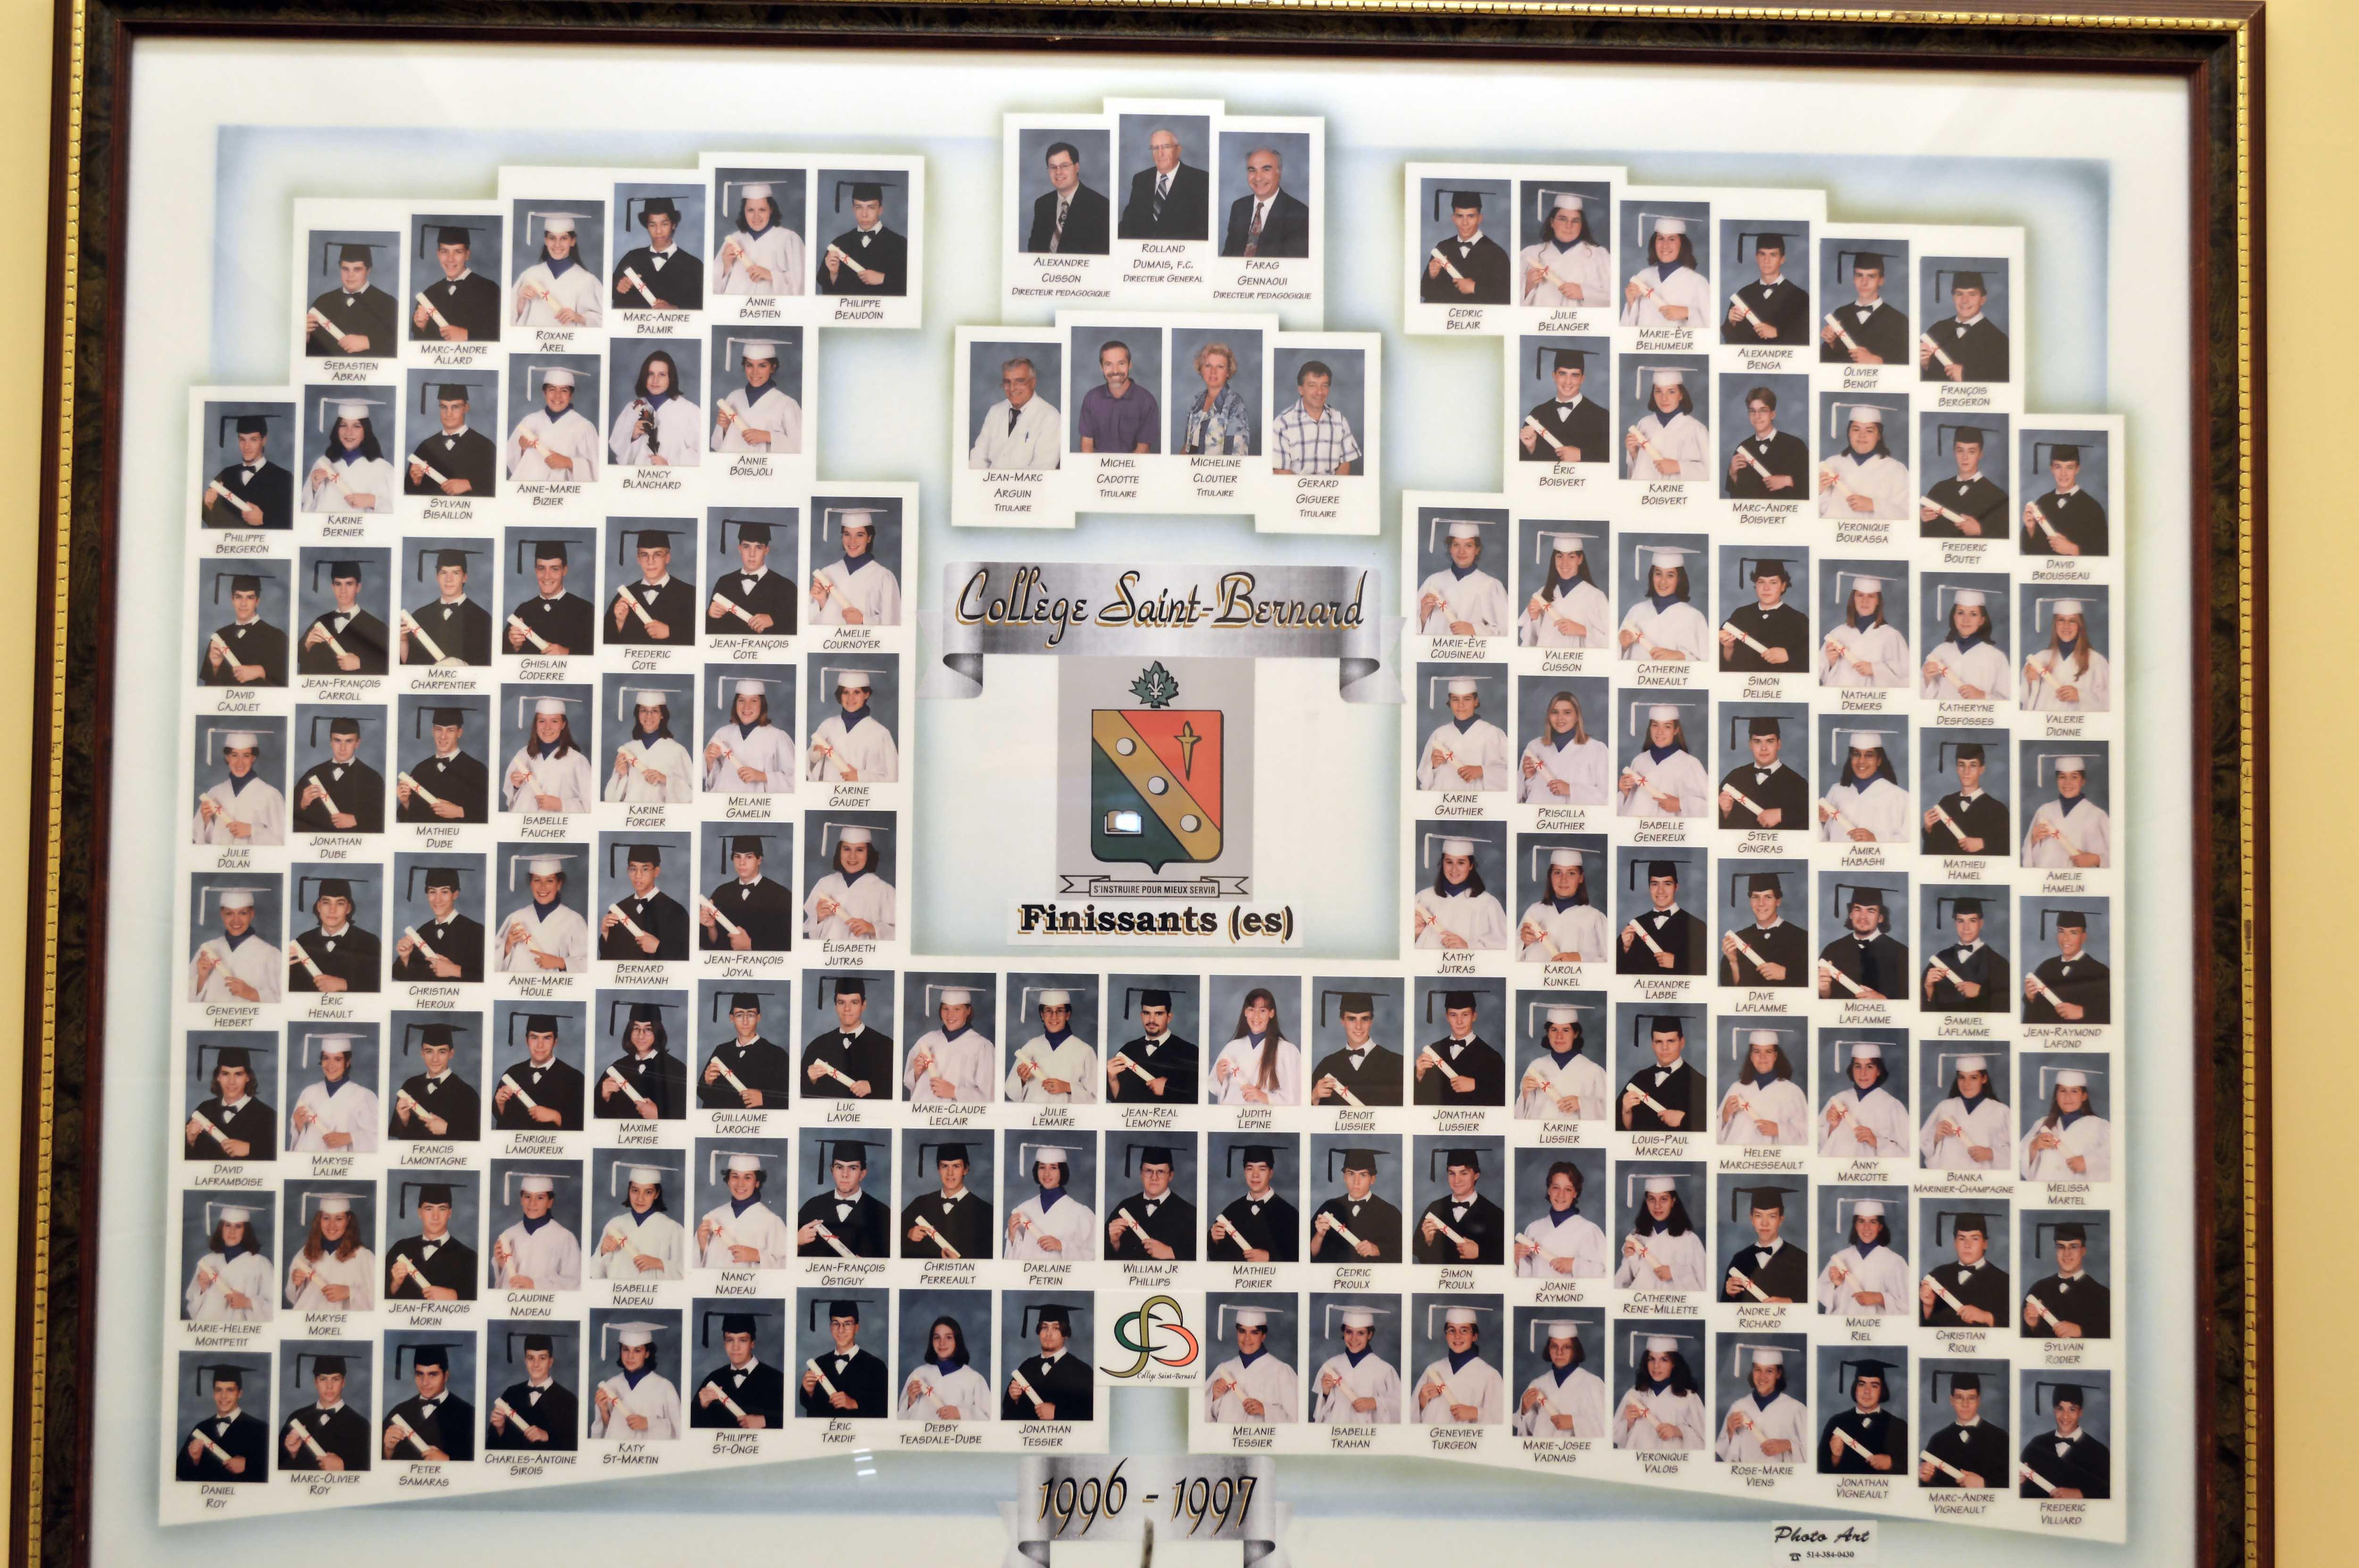 College-Saint-Bernard_Graduations-1996-97